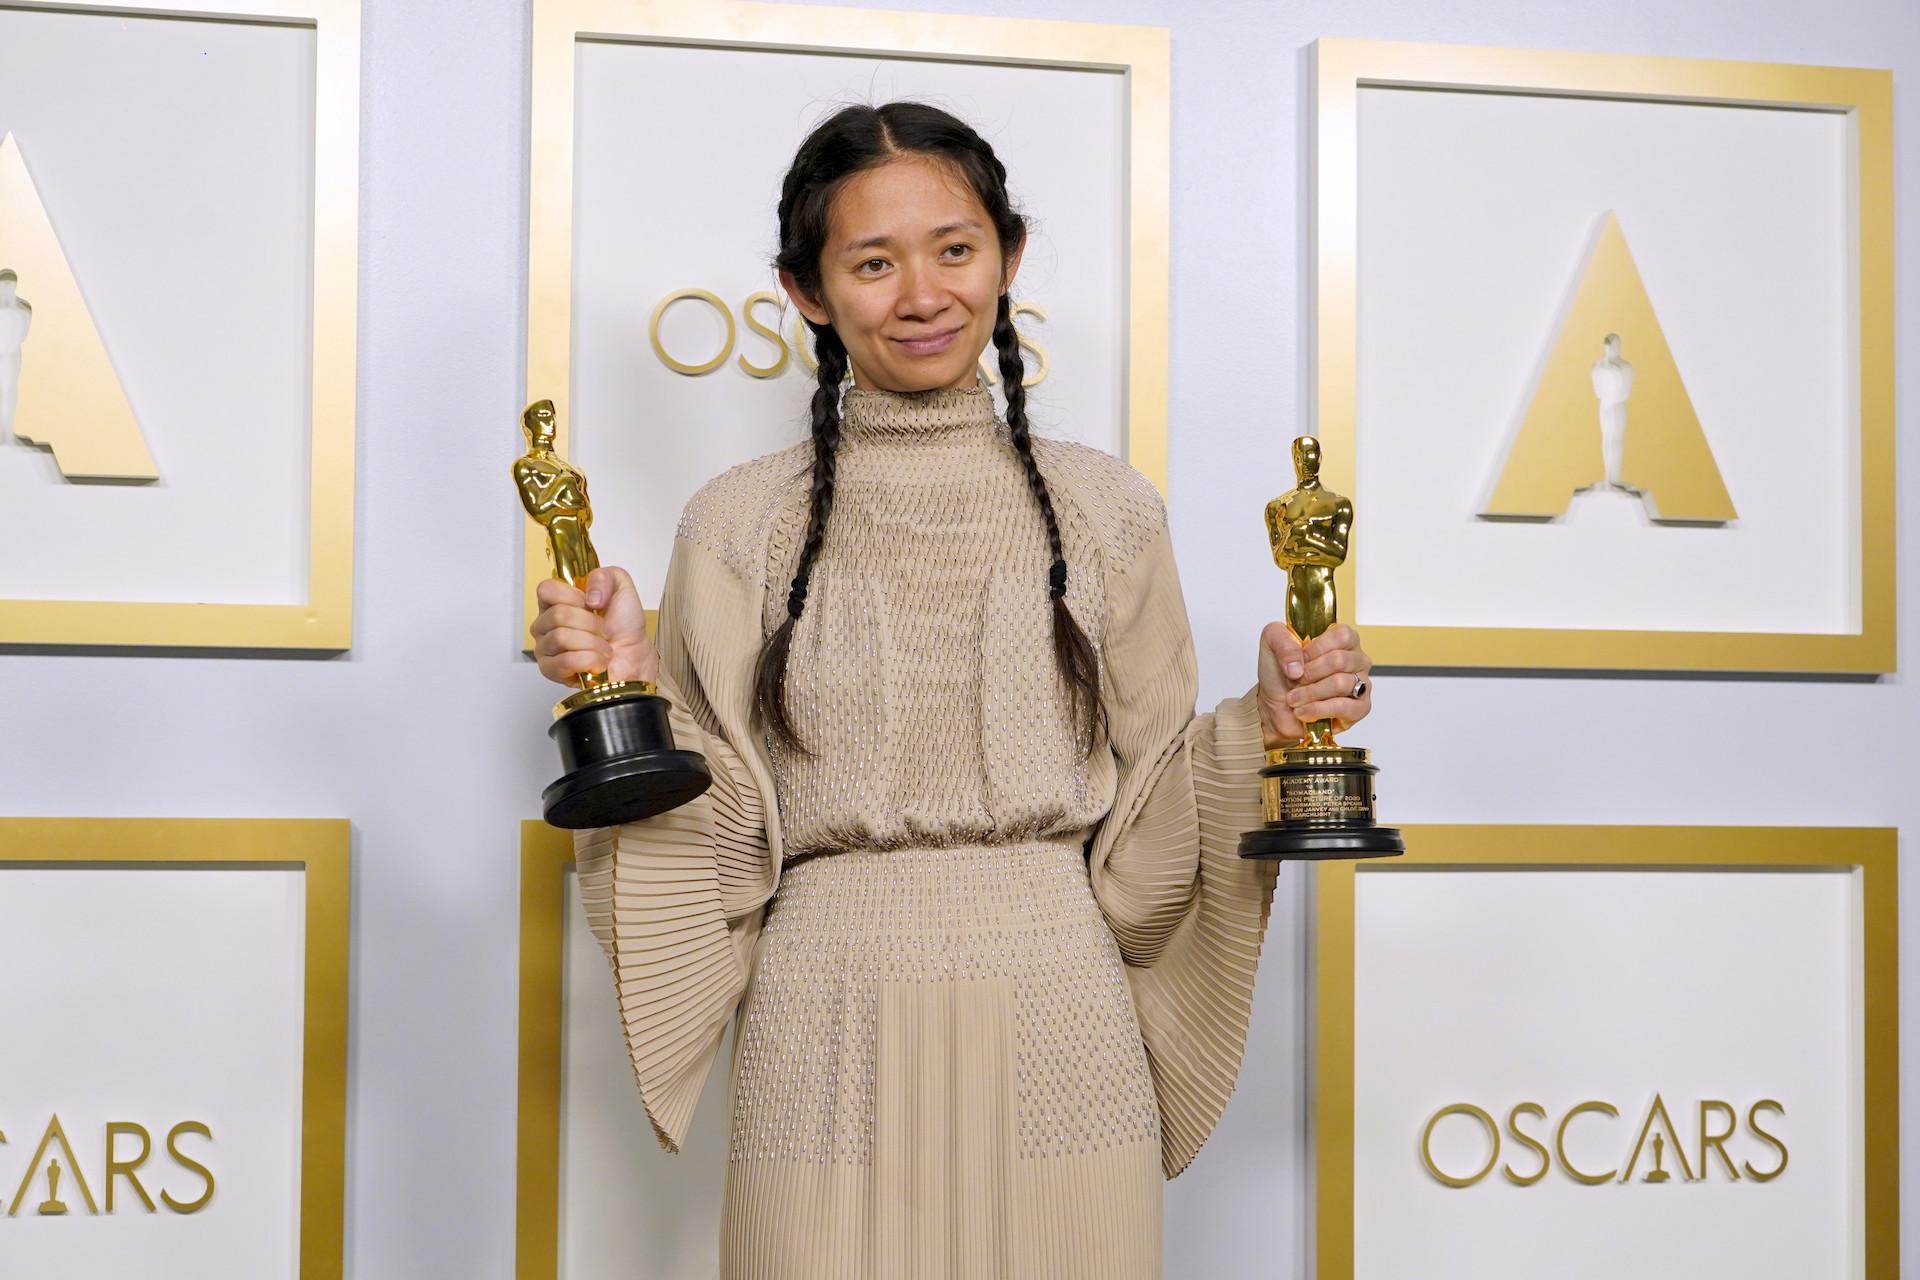 The 2021 Oscar Winners